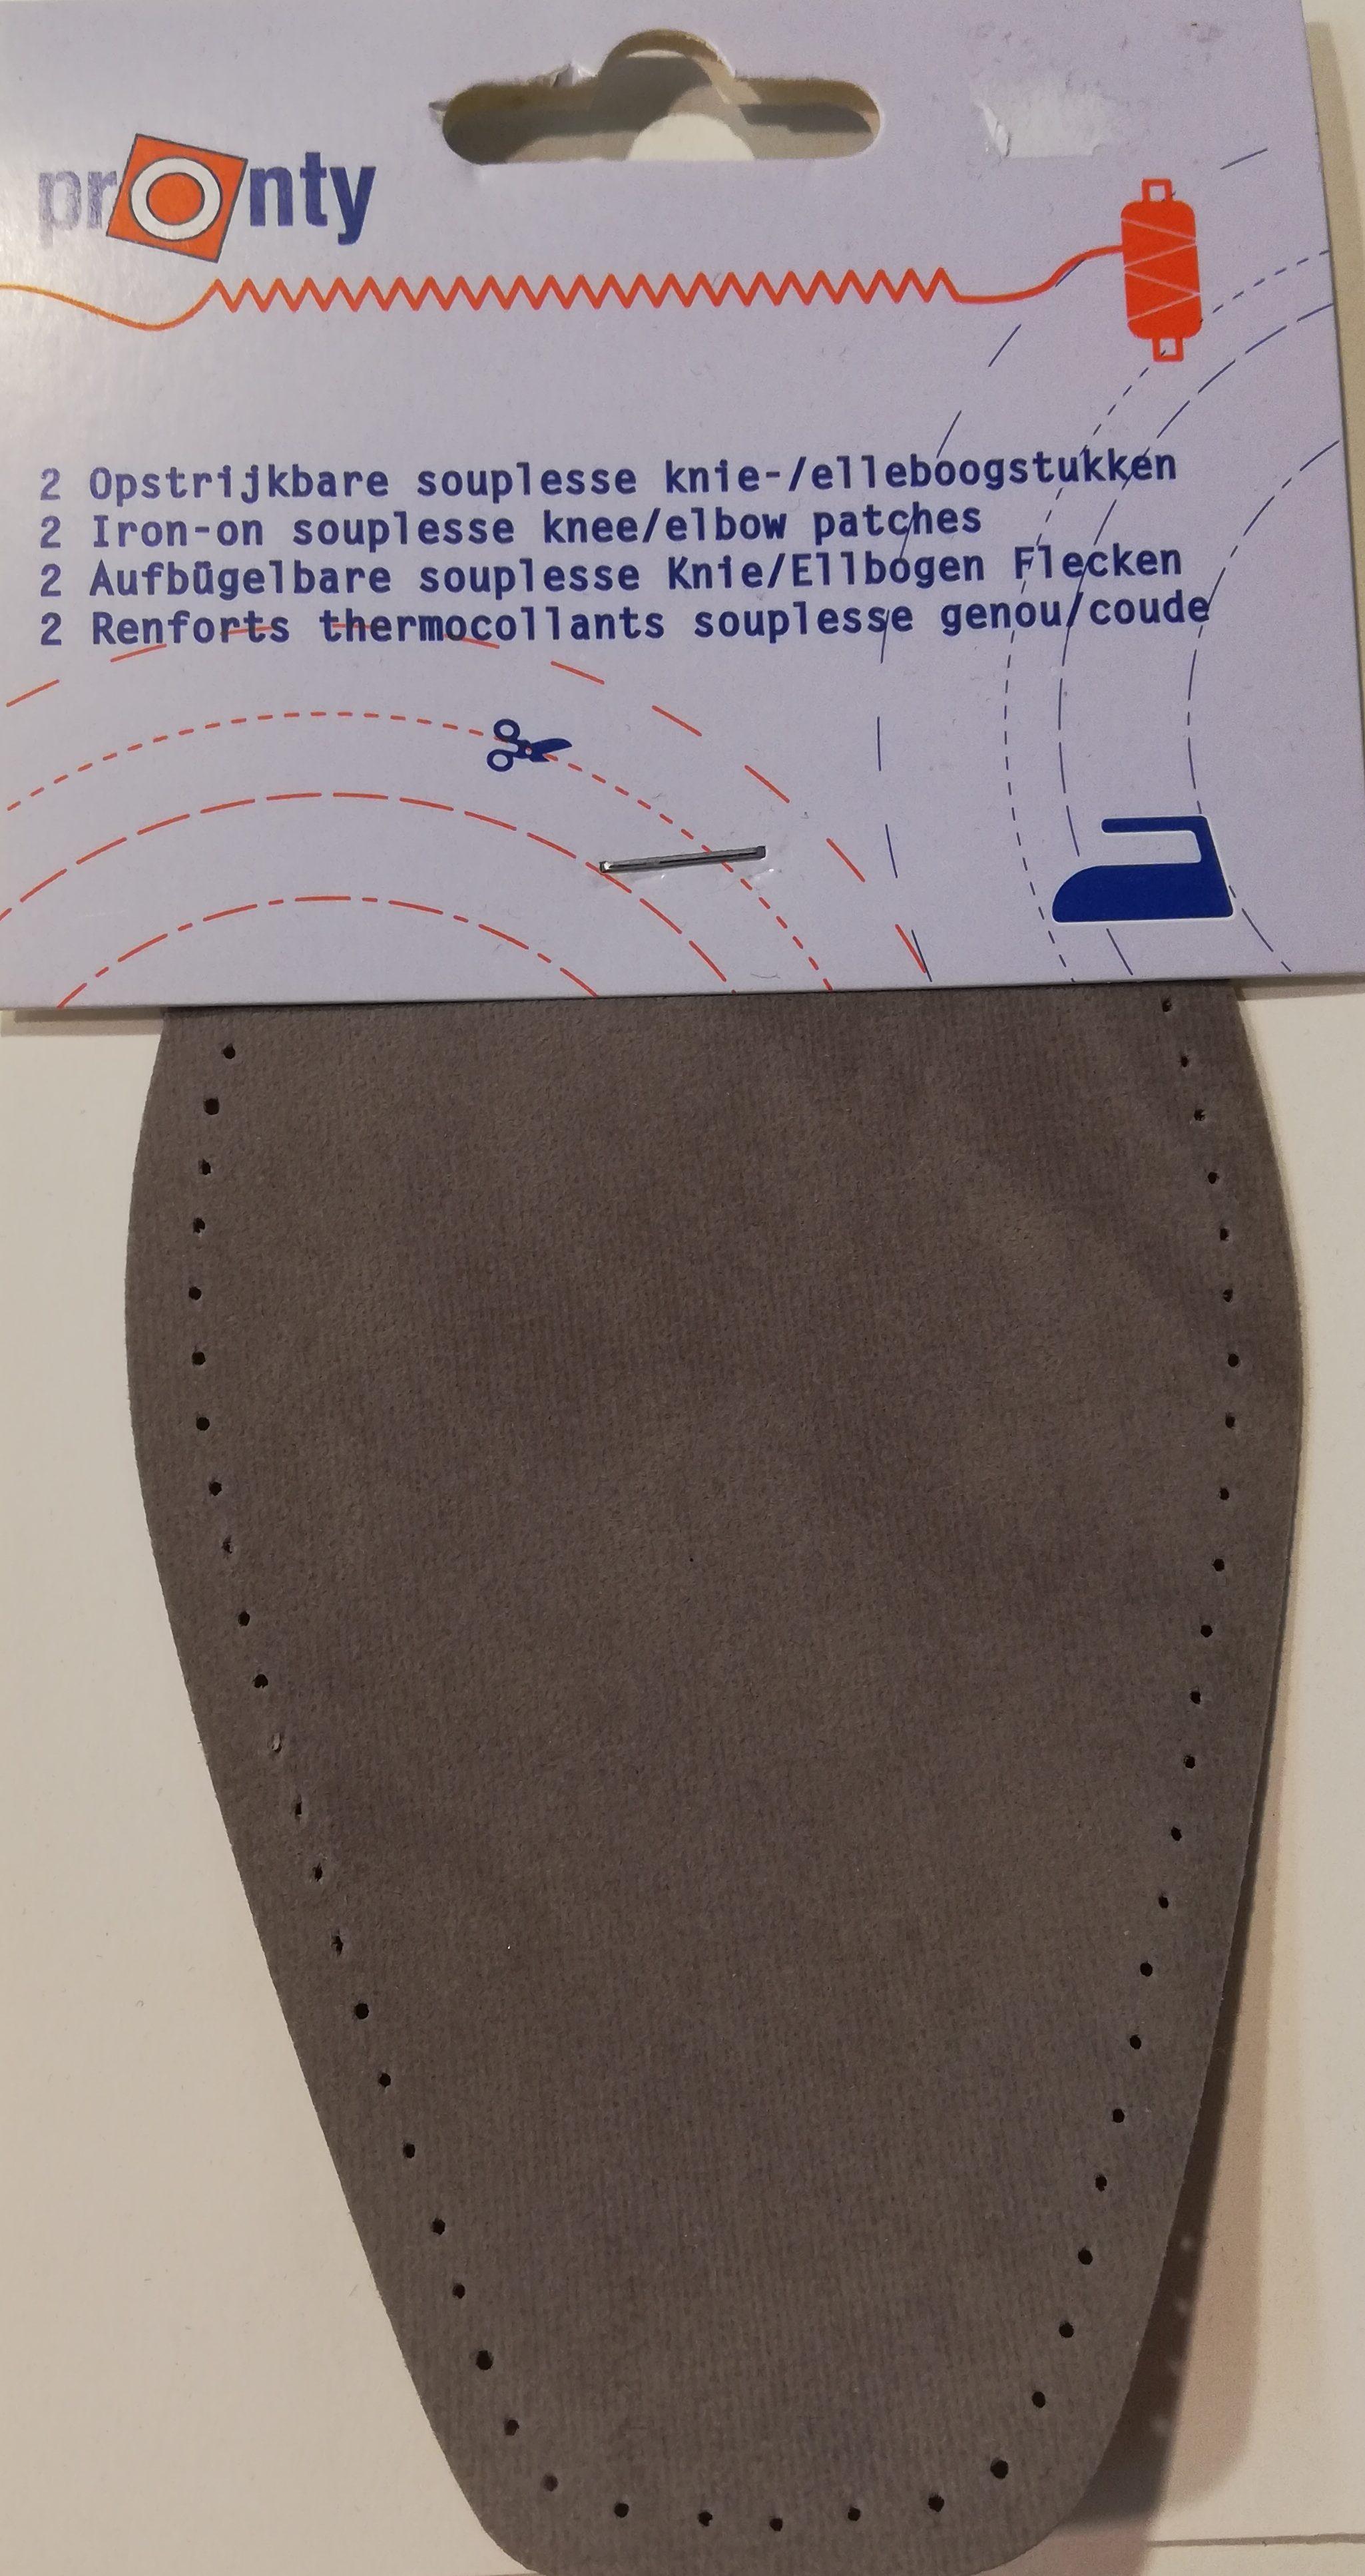 Opstrijkbare knie-/elleboogstukken